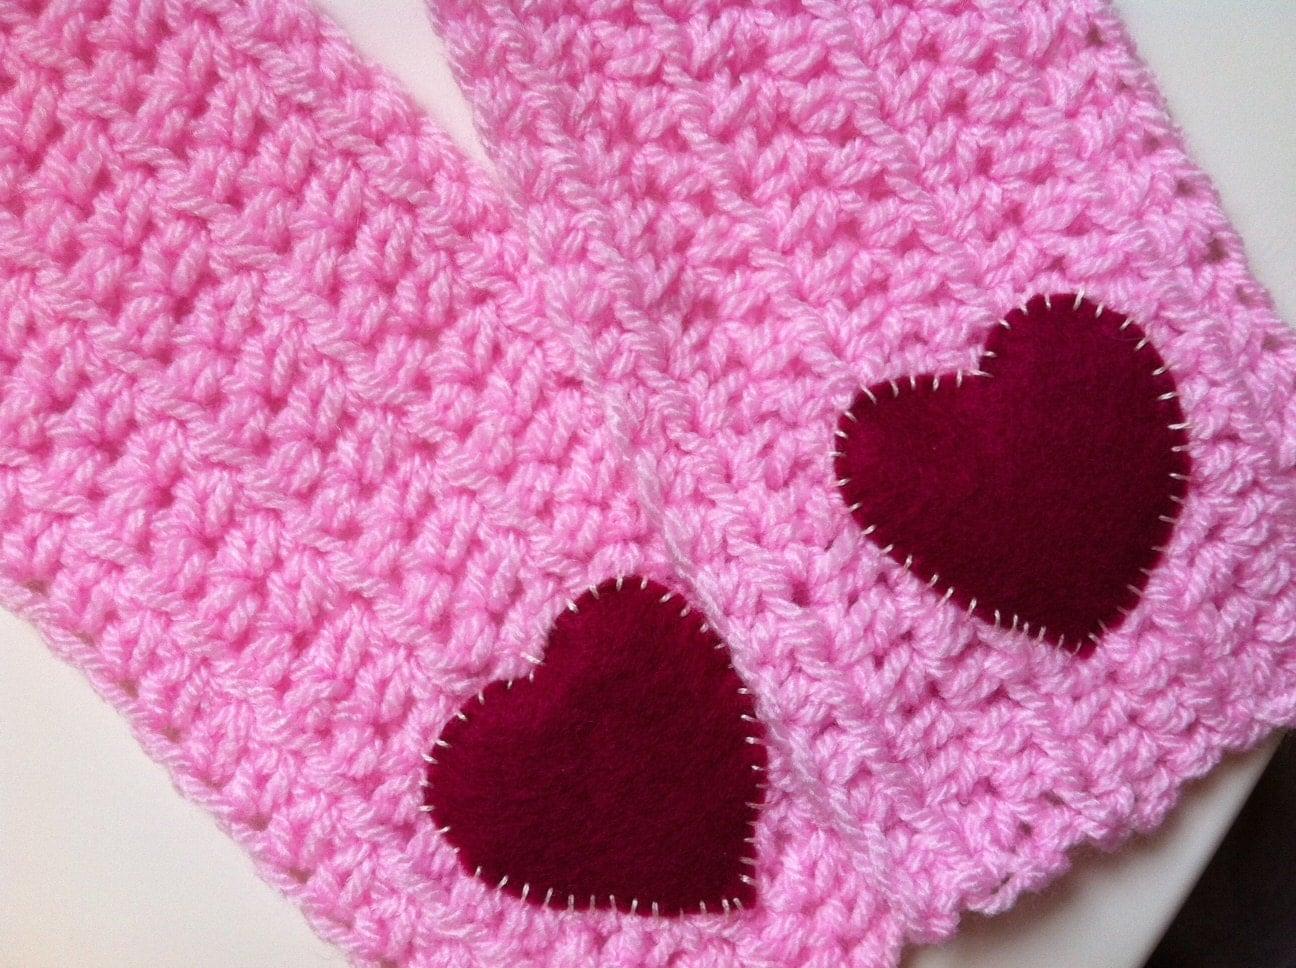 Crochet Scarf Pink Girls Heart Scarf by Kookooed on Etsy Crochet Childrens Scarf